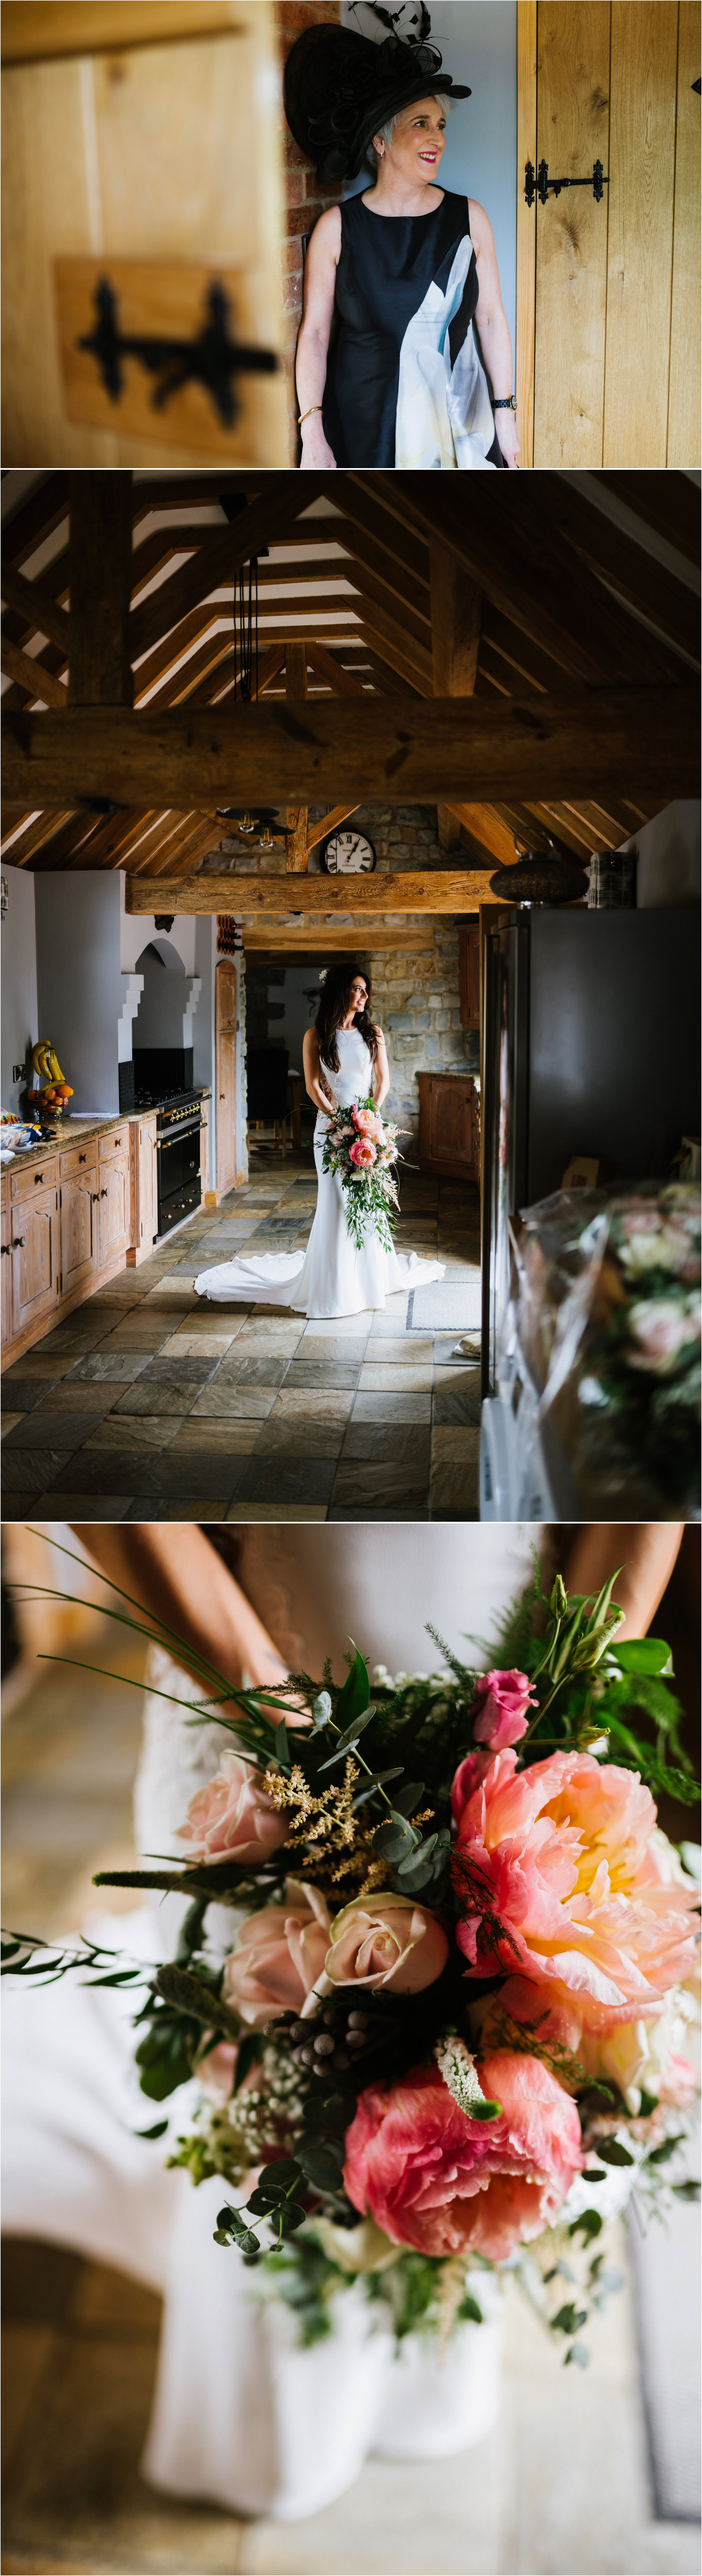 Compton Verney wedding photography_0025.jpg